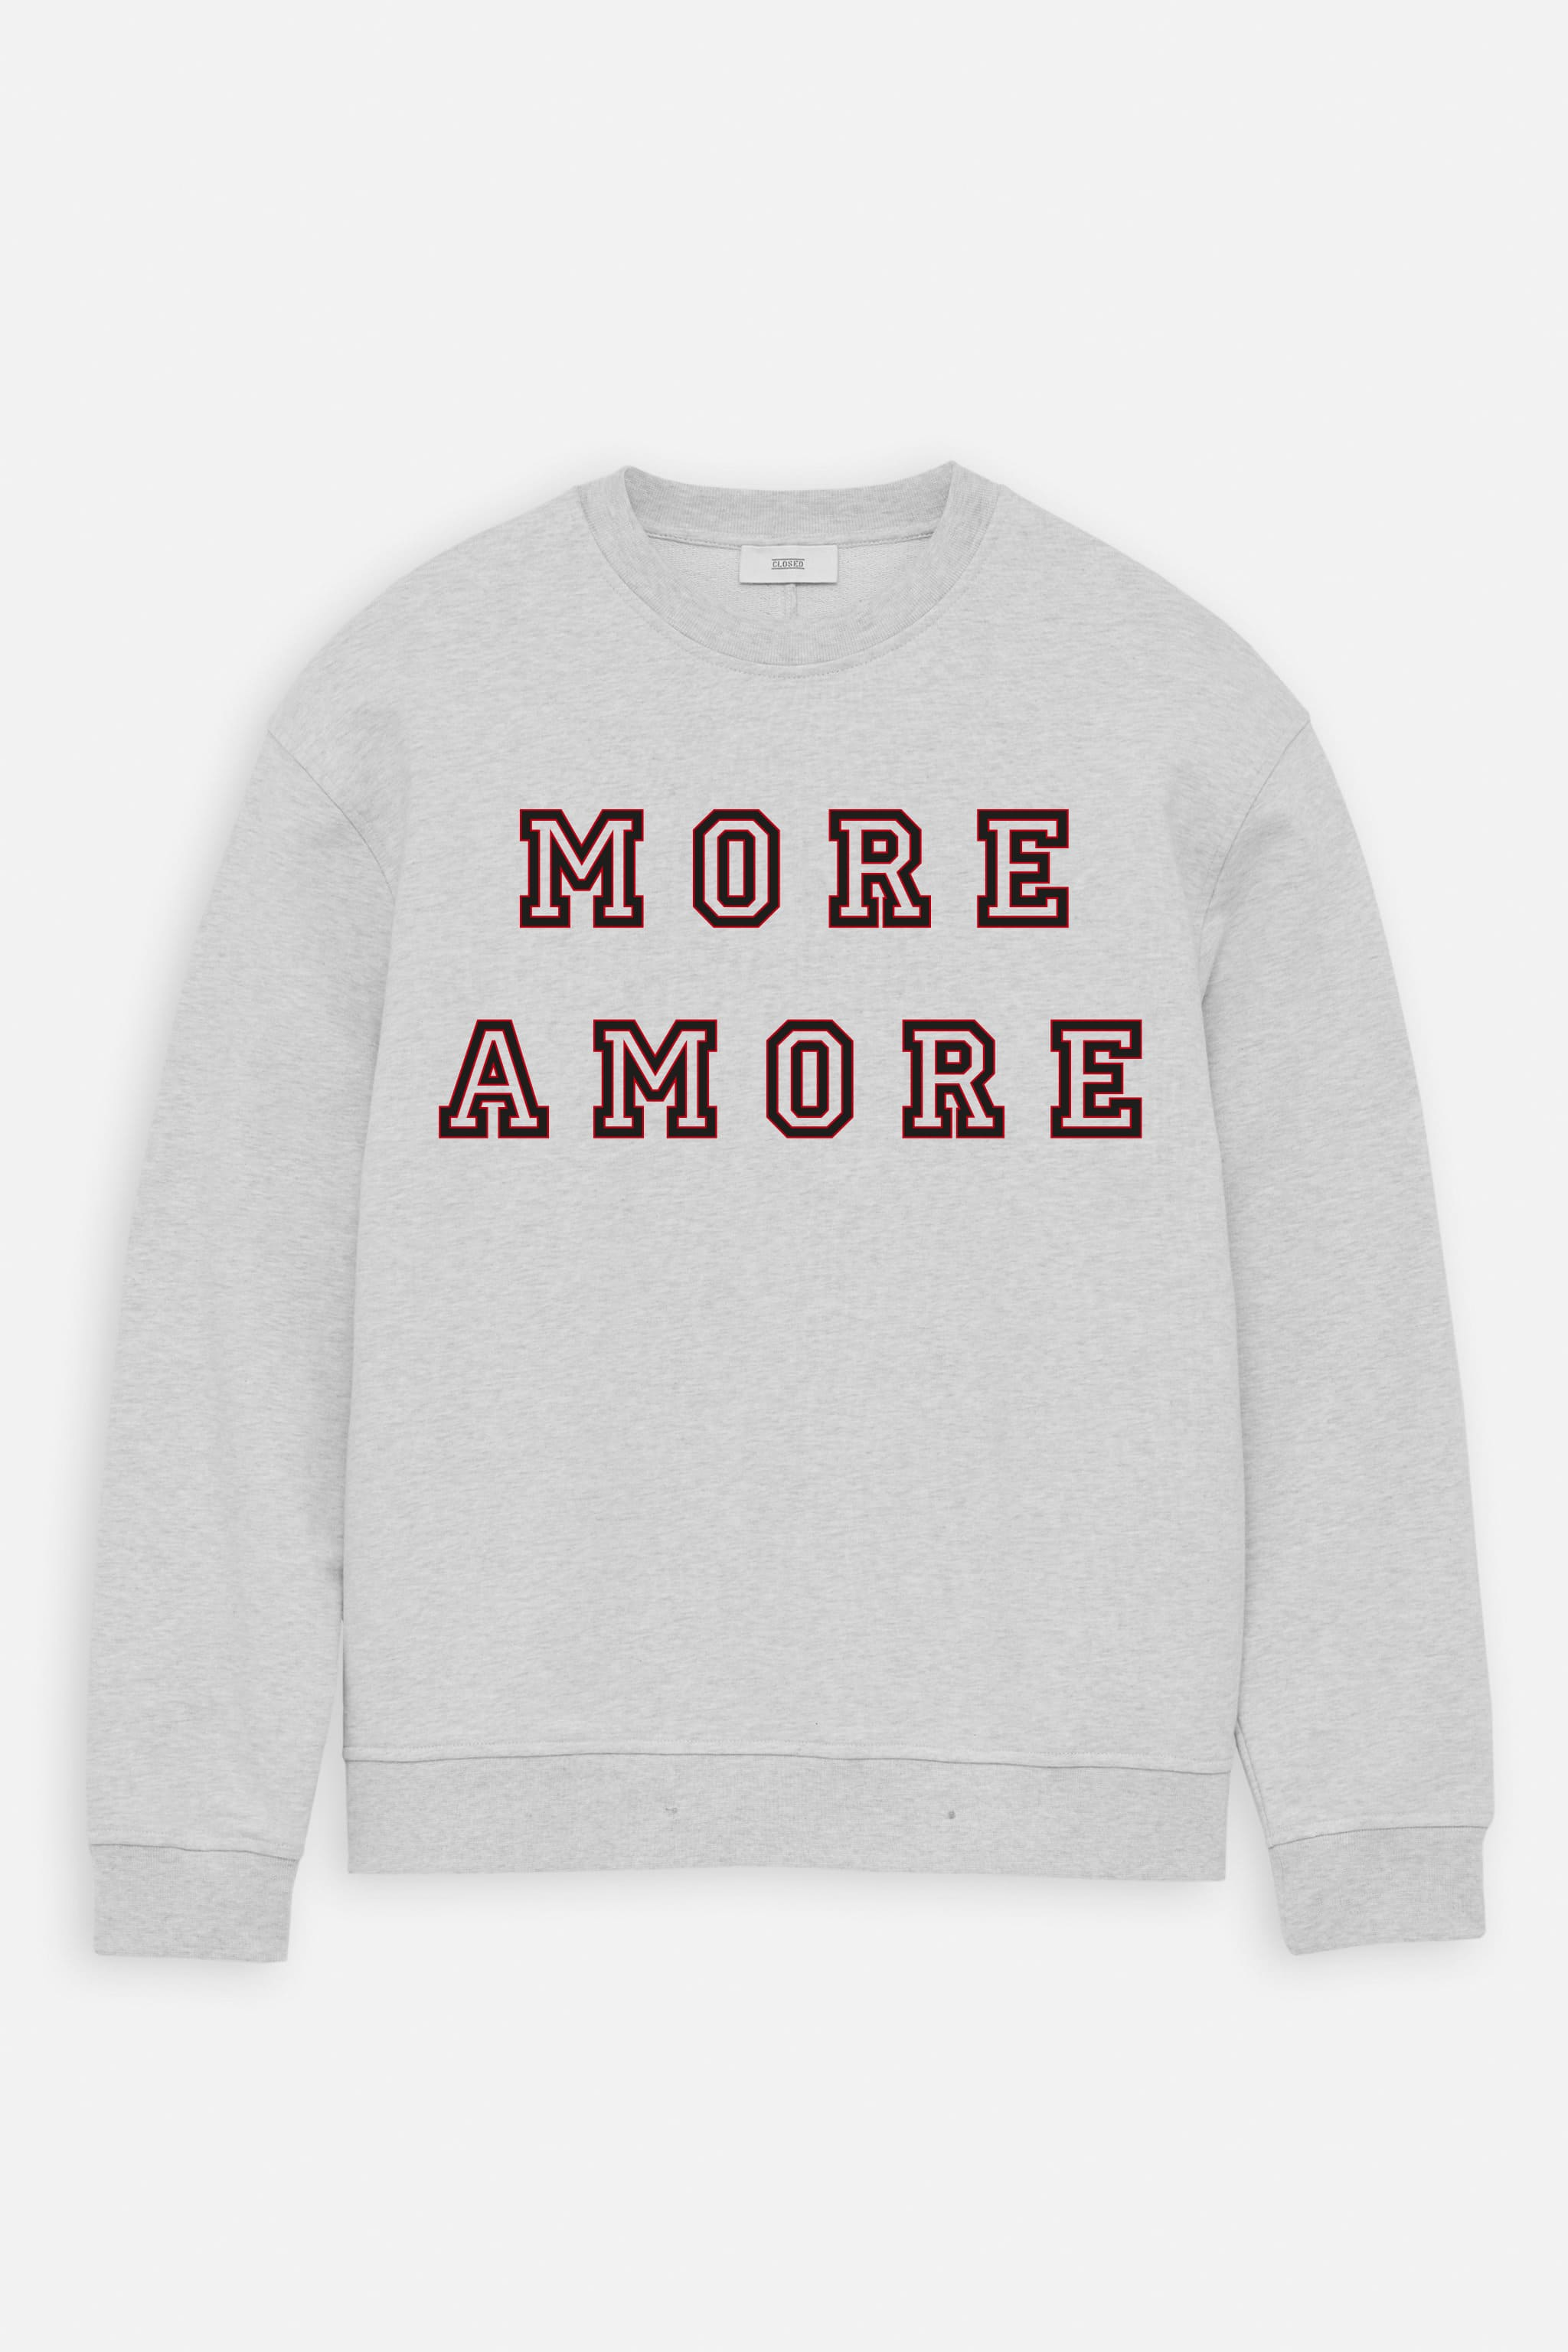 Sweatshirt More Amore